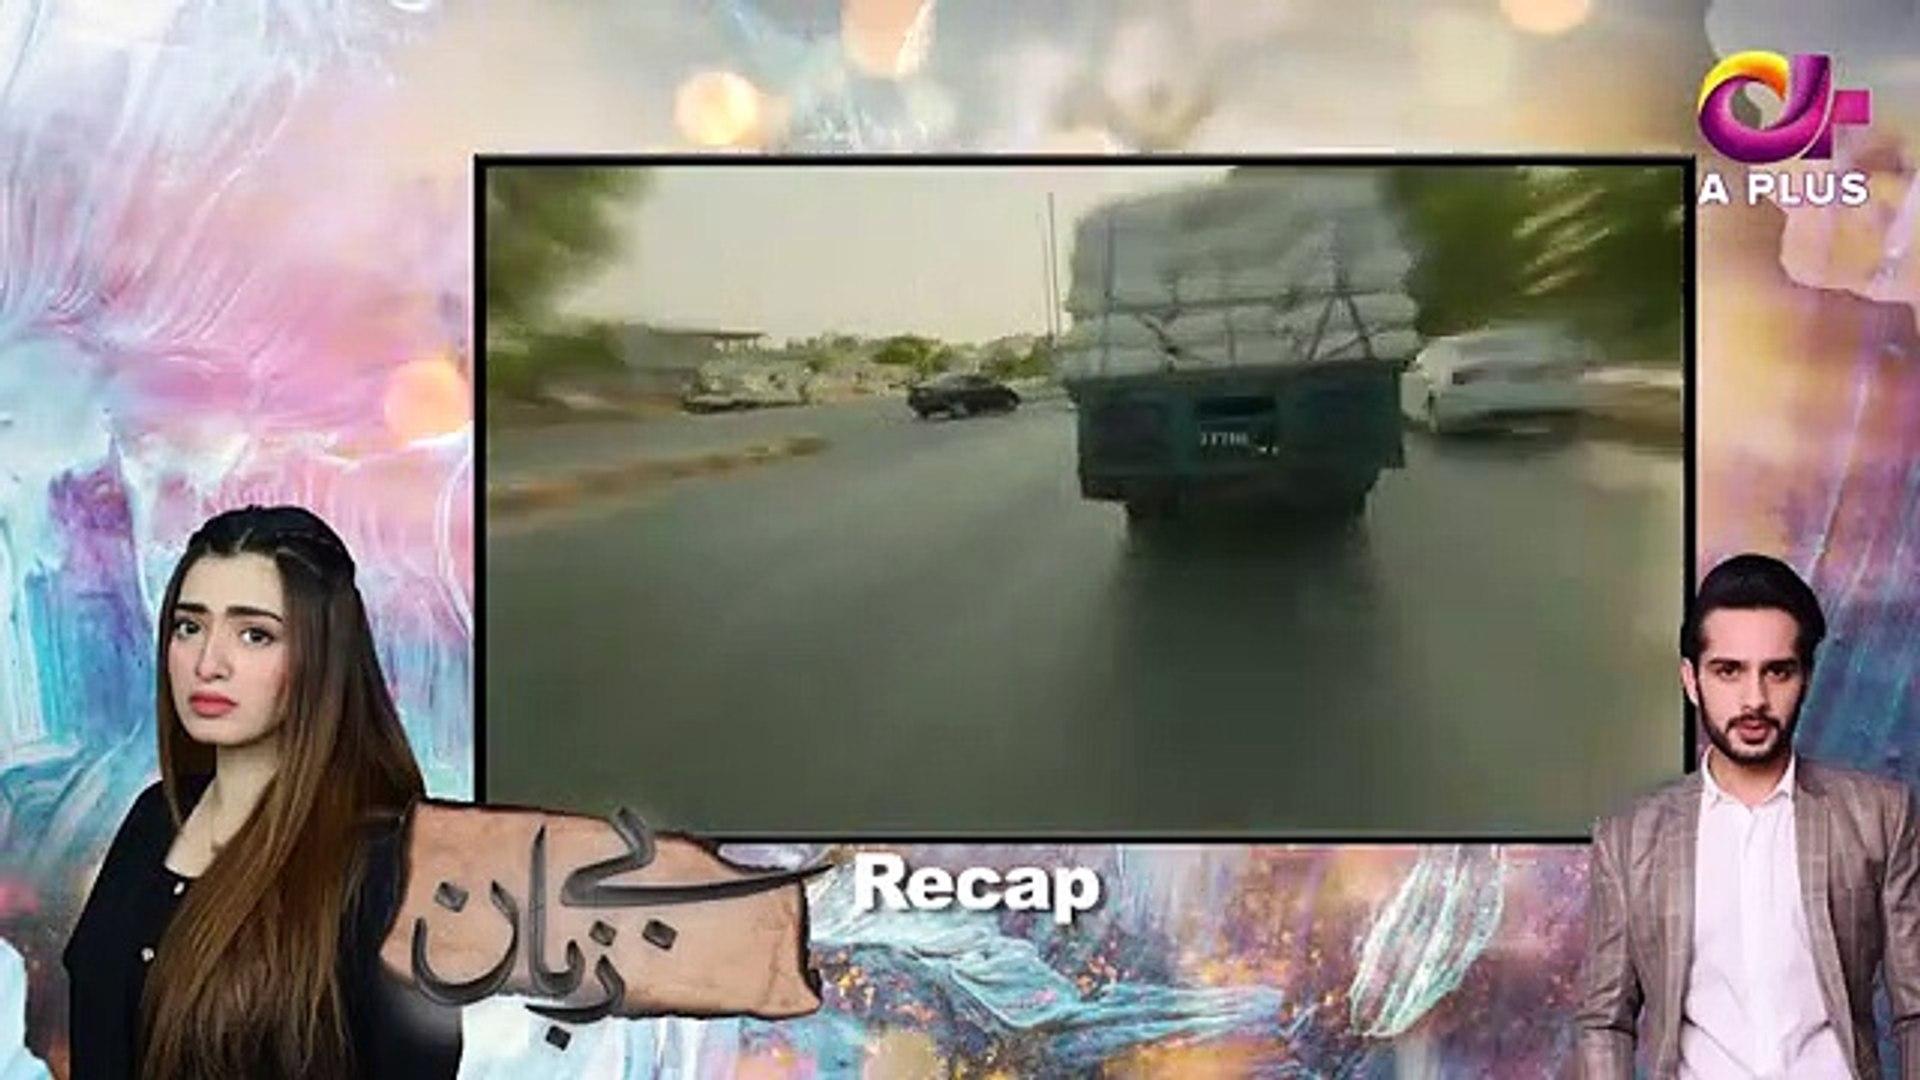 Bezuban - Episode 71 - Aplus Dramas - Usama Khan, Nawal Saeed, Junaid, Mahlaqa - Pakistani Drama